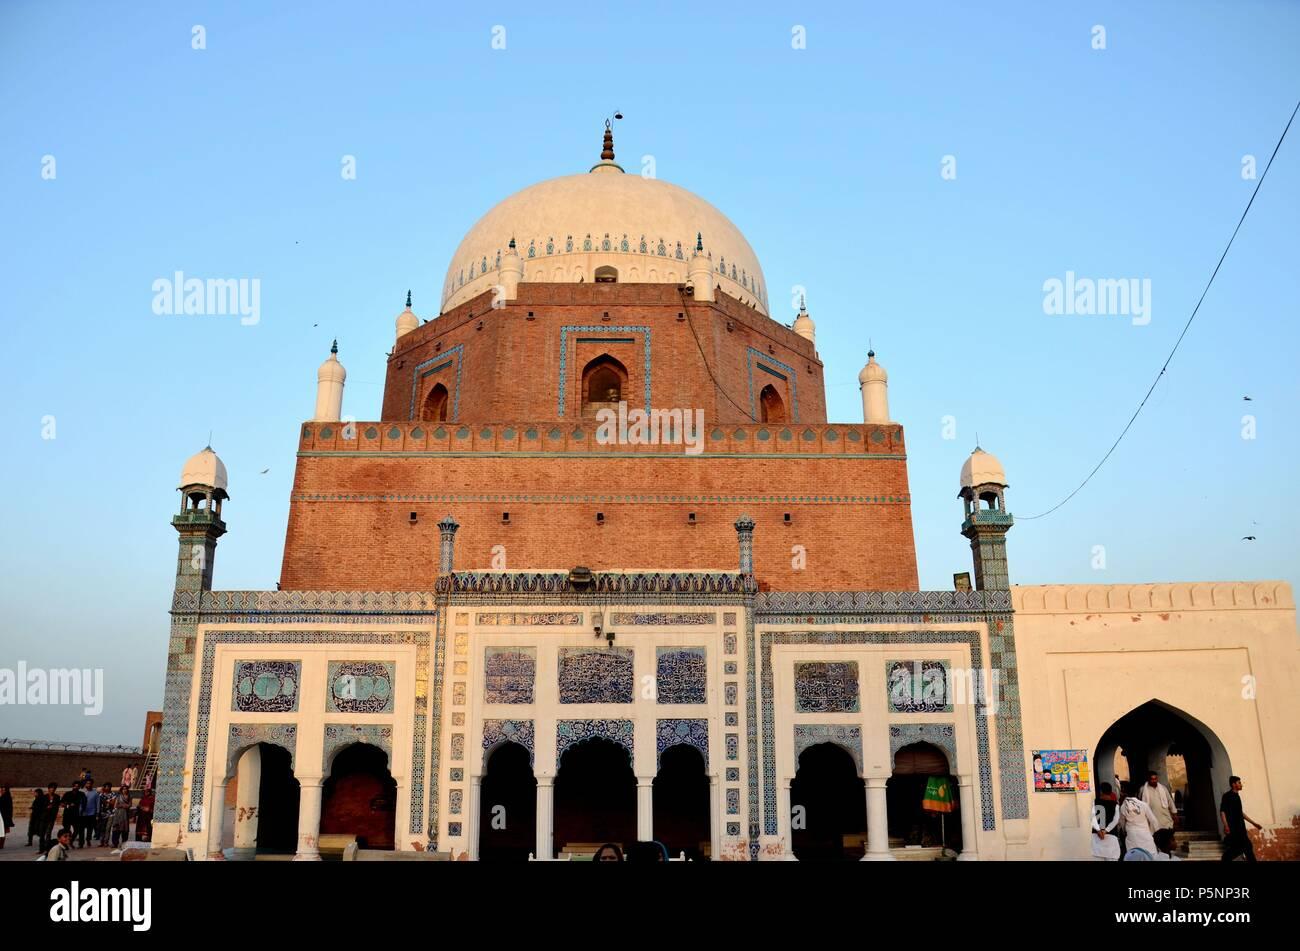 Mausoleum shrine tomb with dome of Sufi saint Pir Sheikh Bahauddin Zakariya Multan City of Saints Pakistan - Stock Image